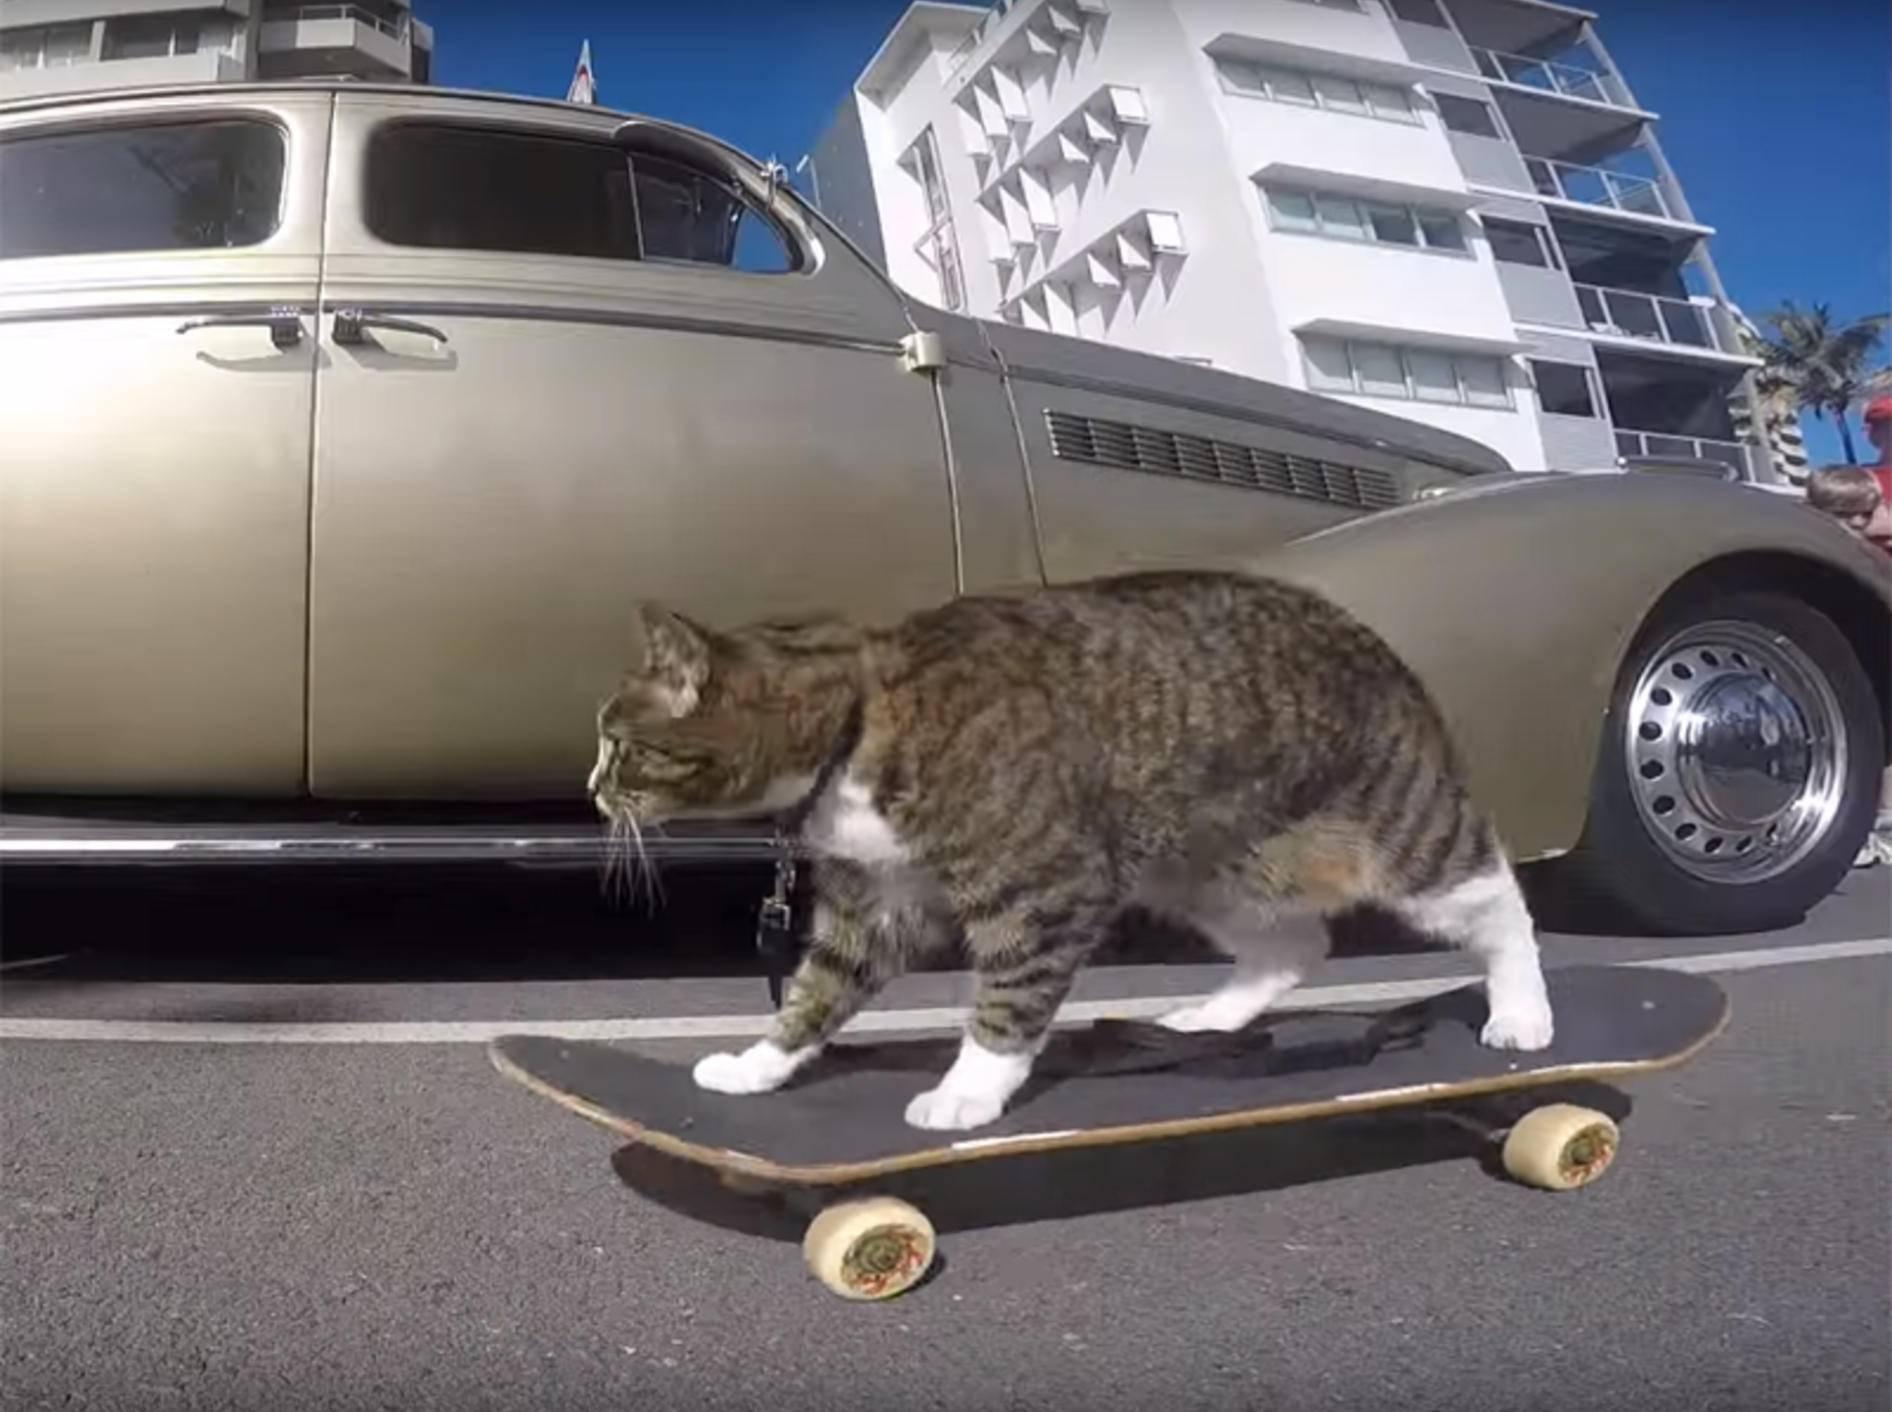 Katze Didga fährt gern Skateboard – YouTube / CATMANTOO